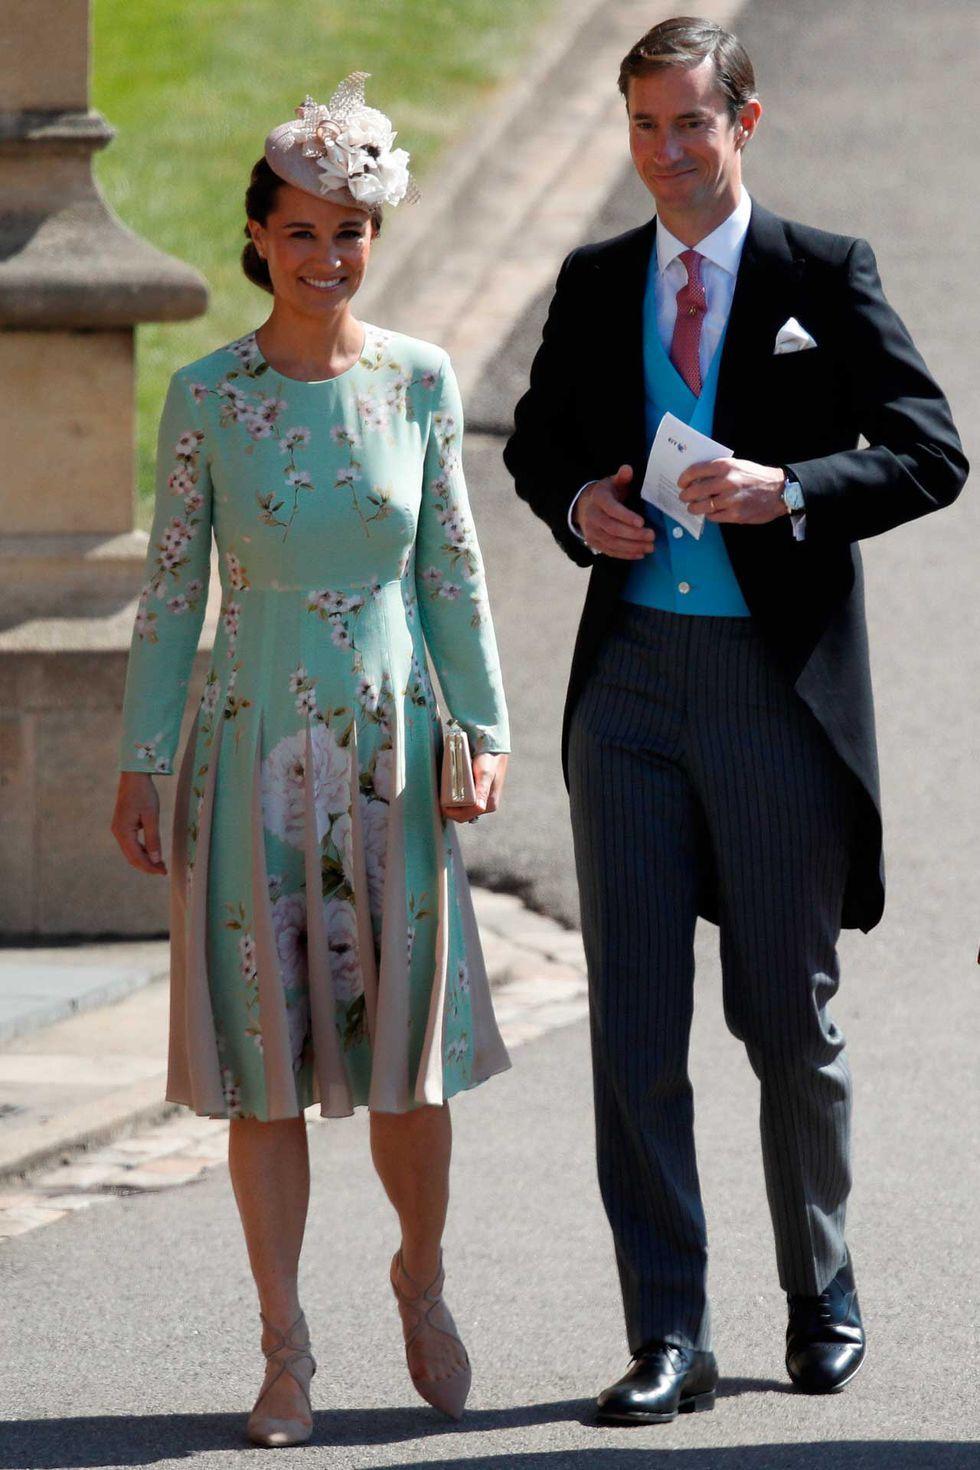 Vestido pippa middleton boda harry